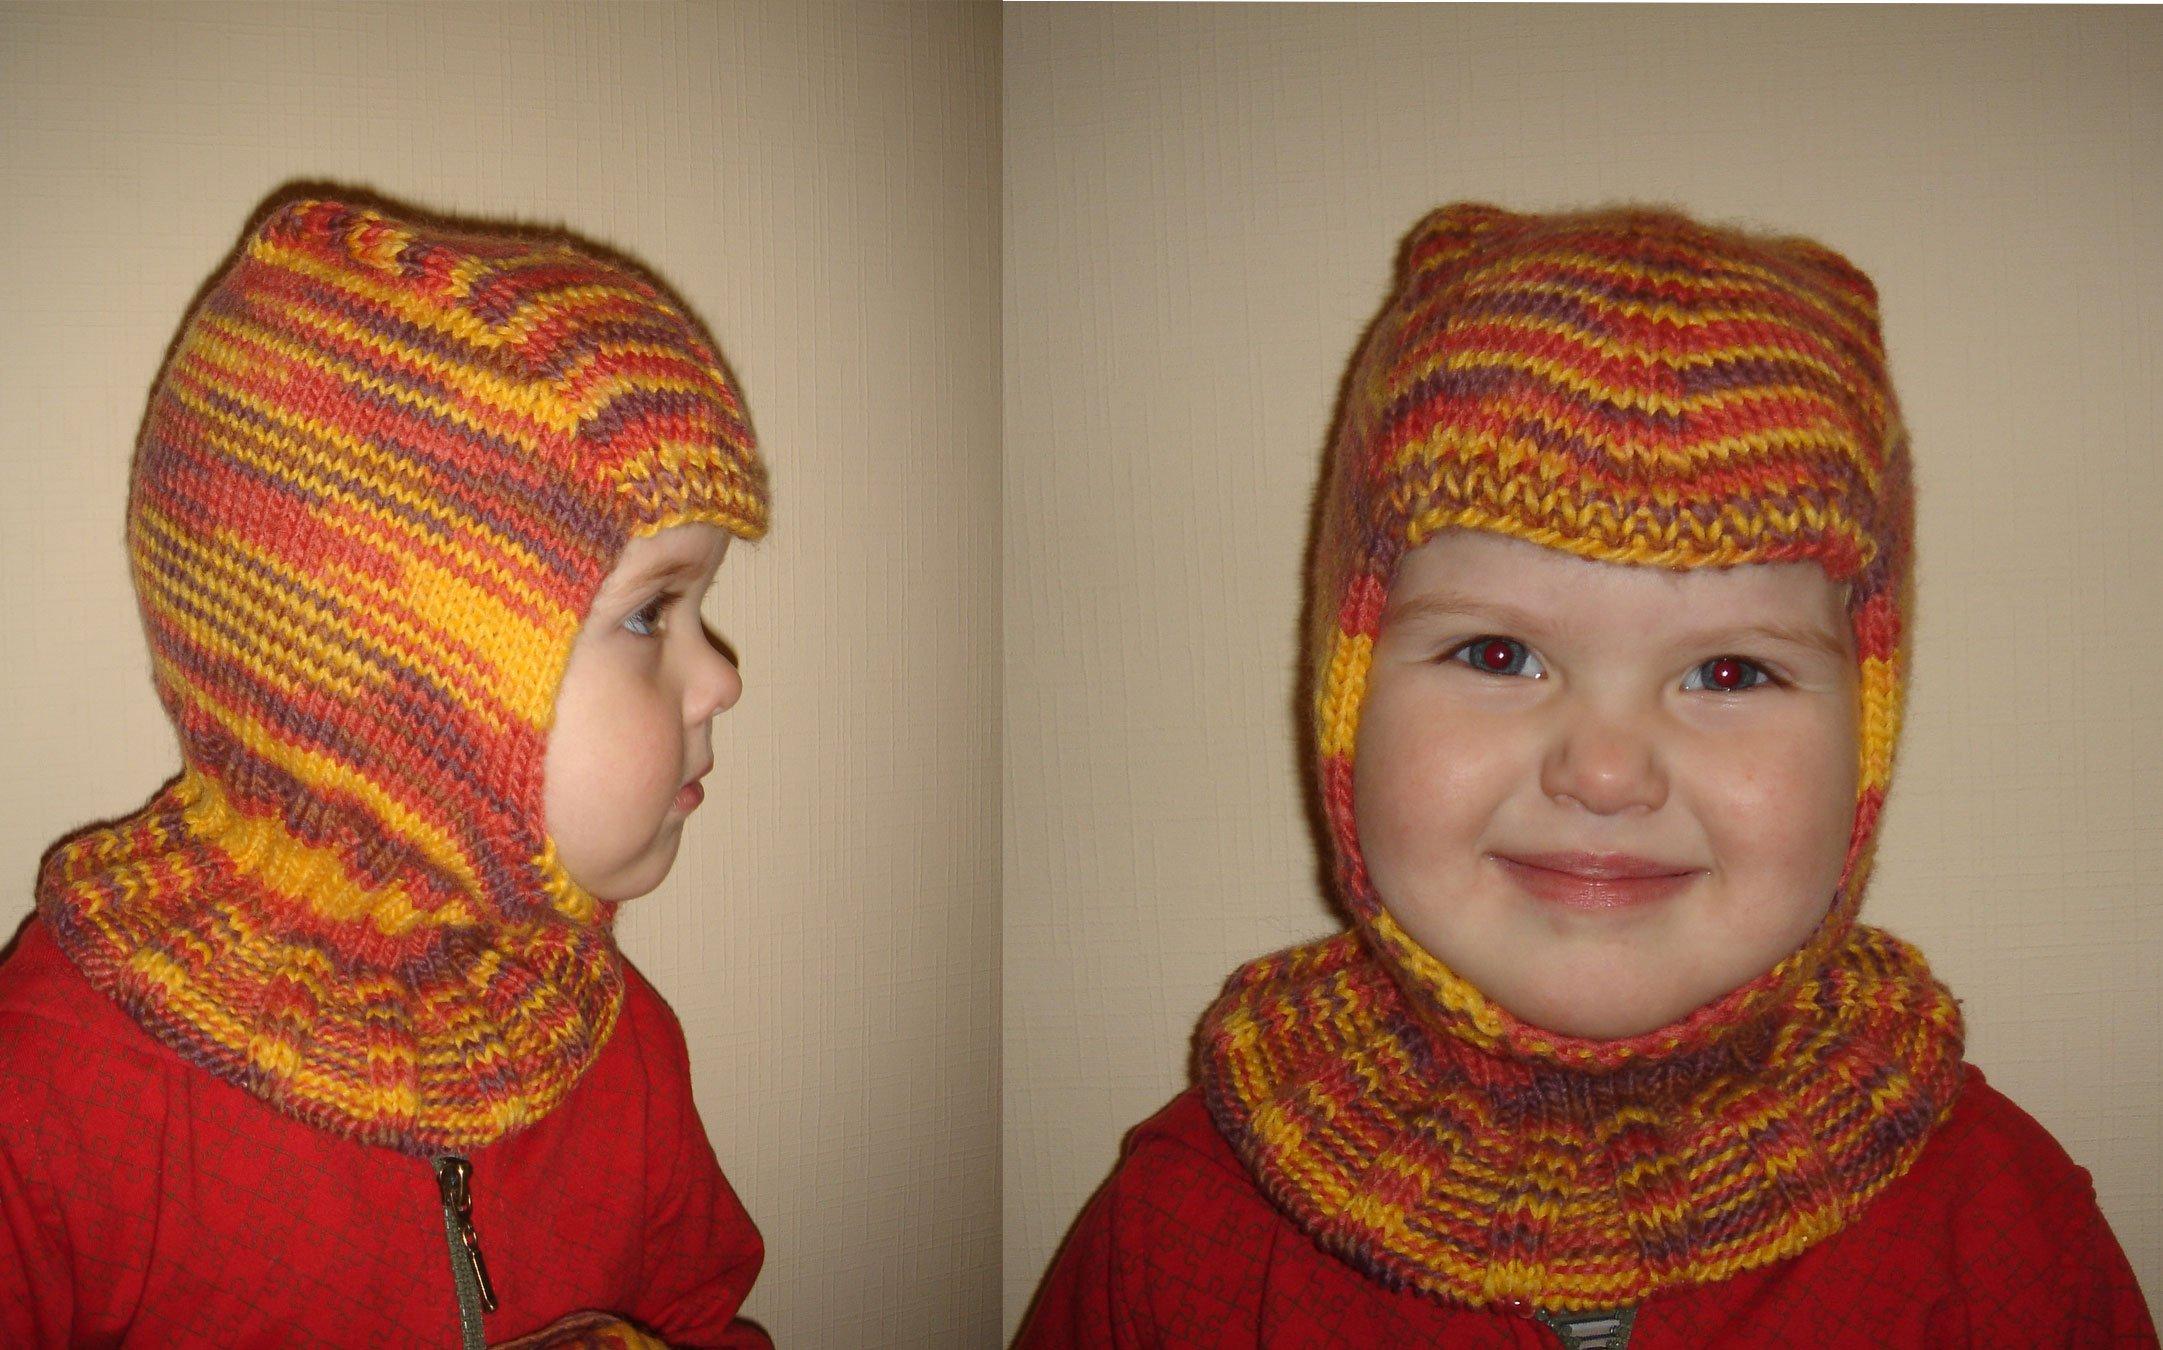 Шапка-шлем для девочки своими руками фото 637